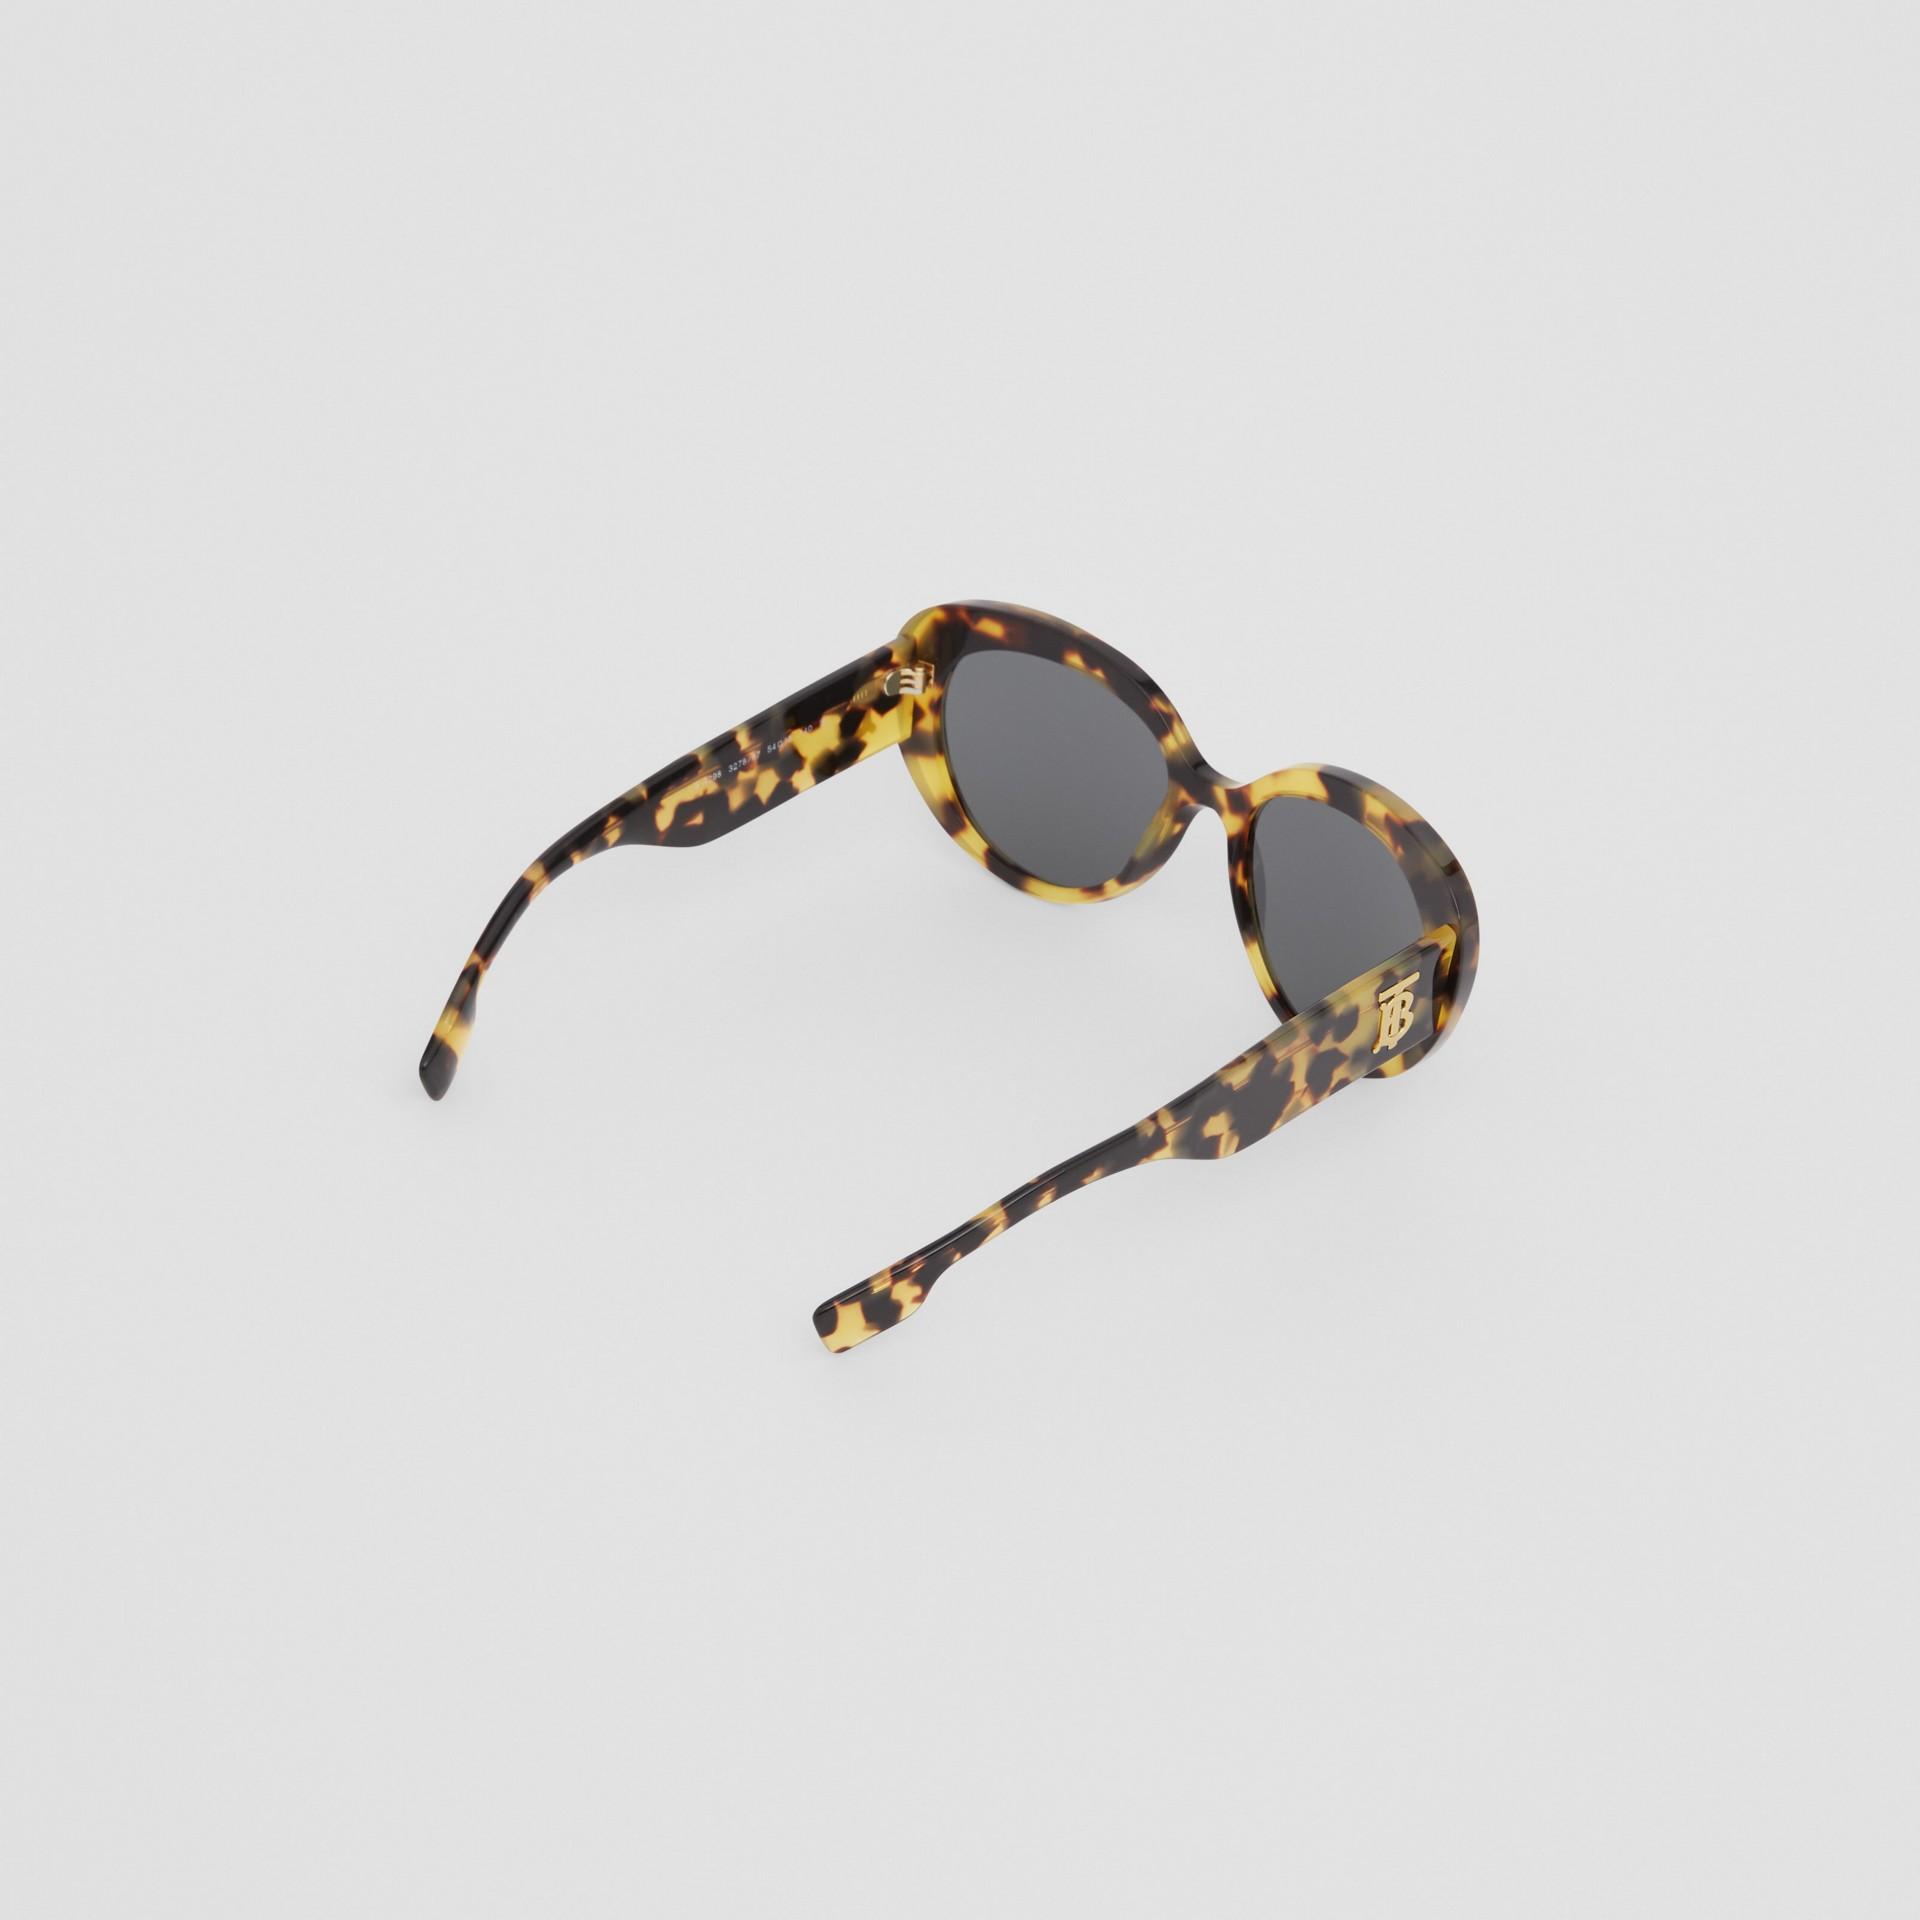 Monogram Motif Cat-eye Frame Sunglasses in Bright Tortoiseshell - Women | Burberry - gallery image 4